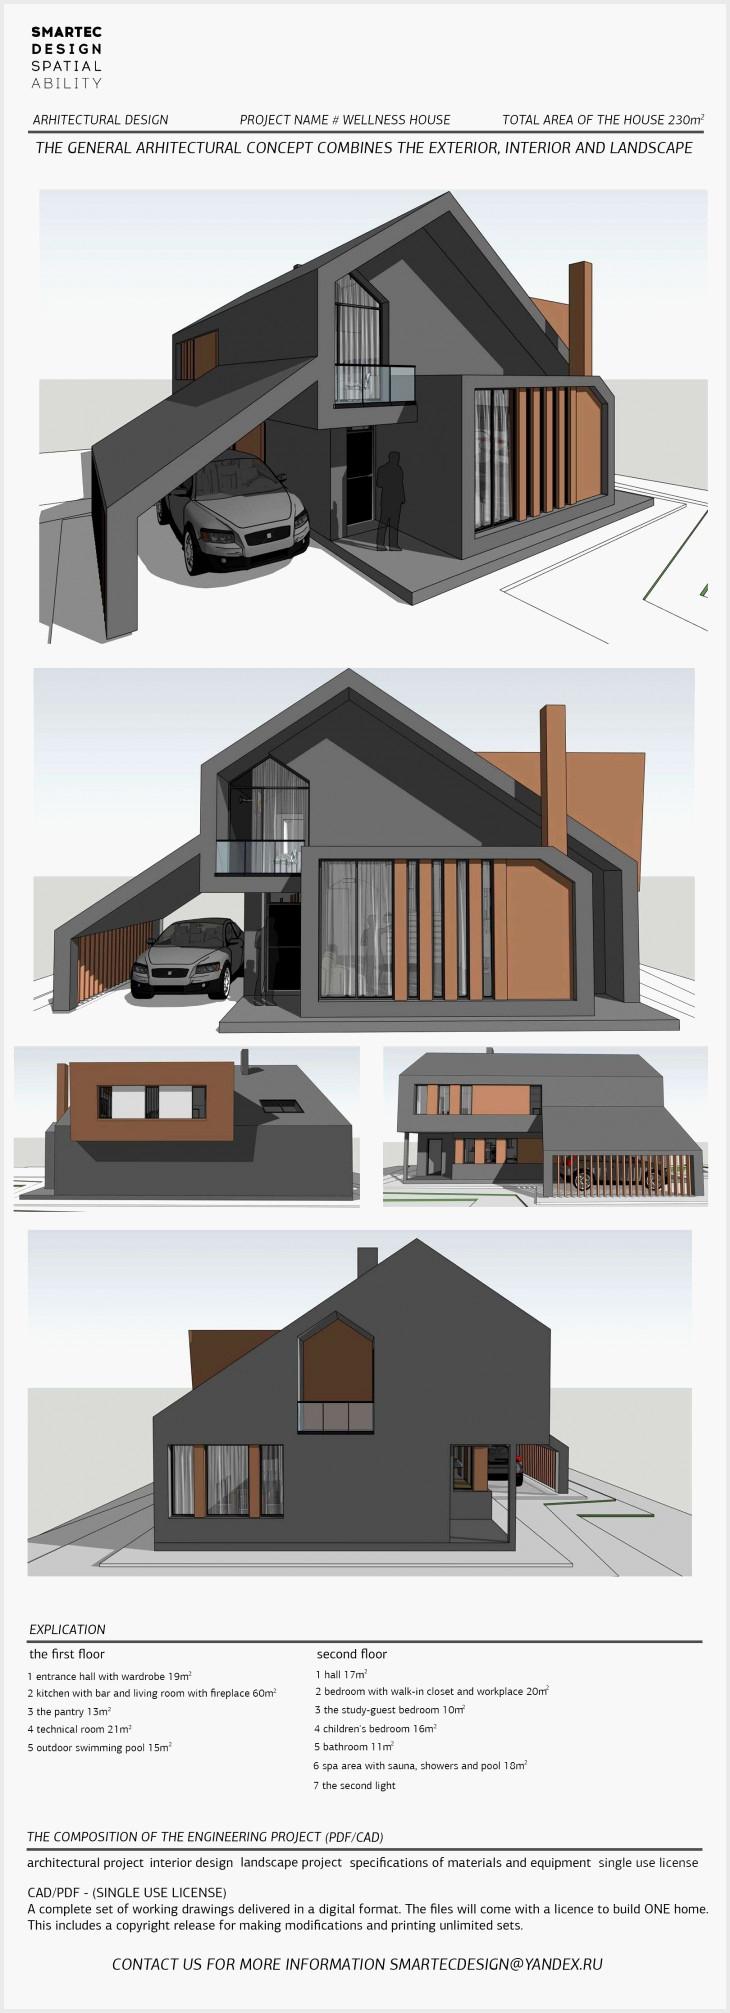 home interior design photos pdf home design floor plans new drawing floor plans luxury sketchup house plans unique home plans 0d